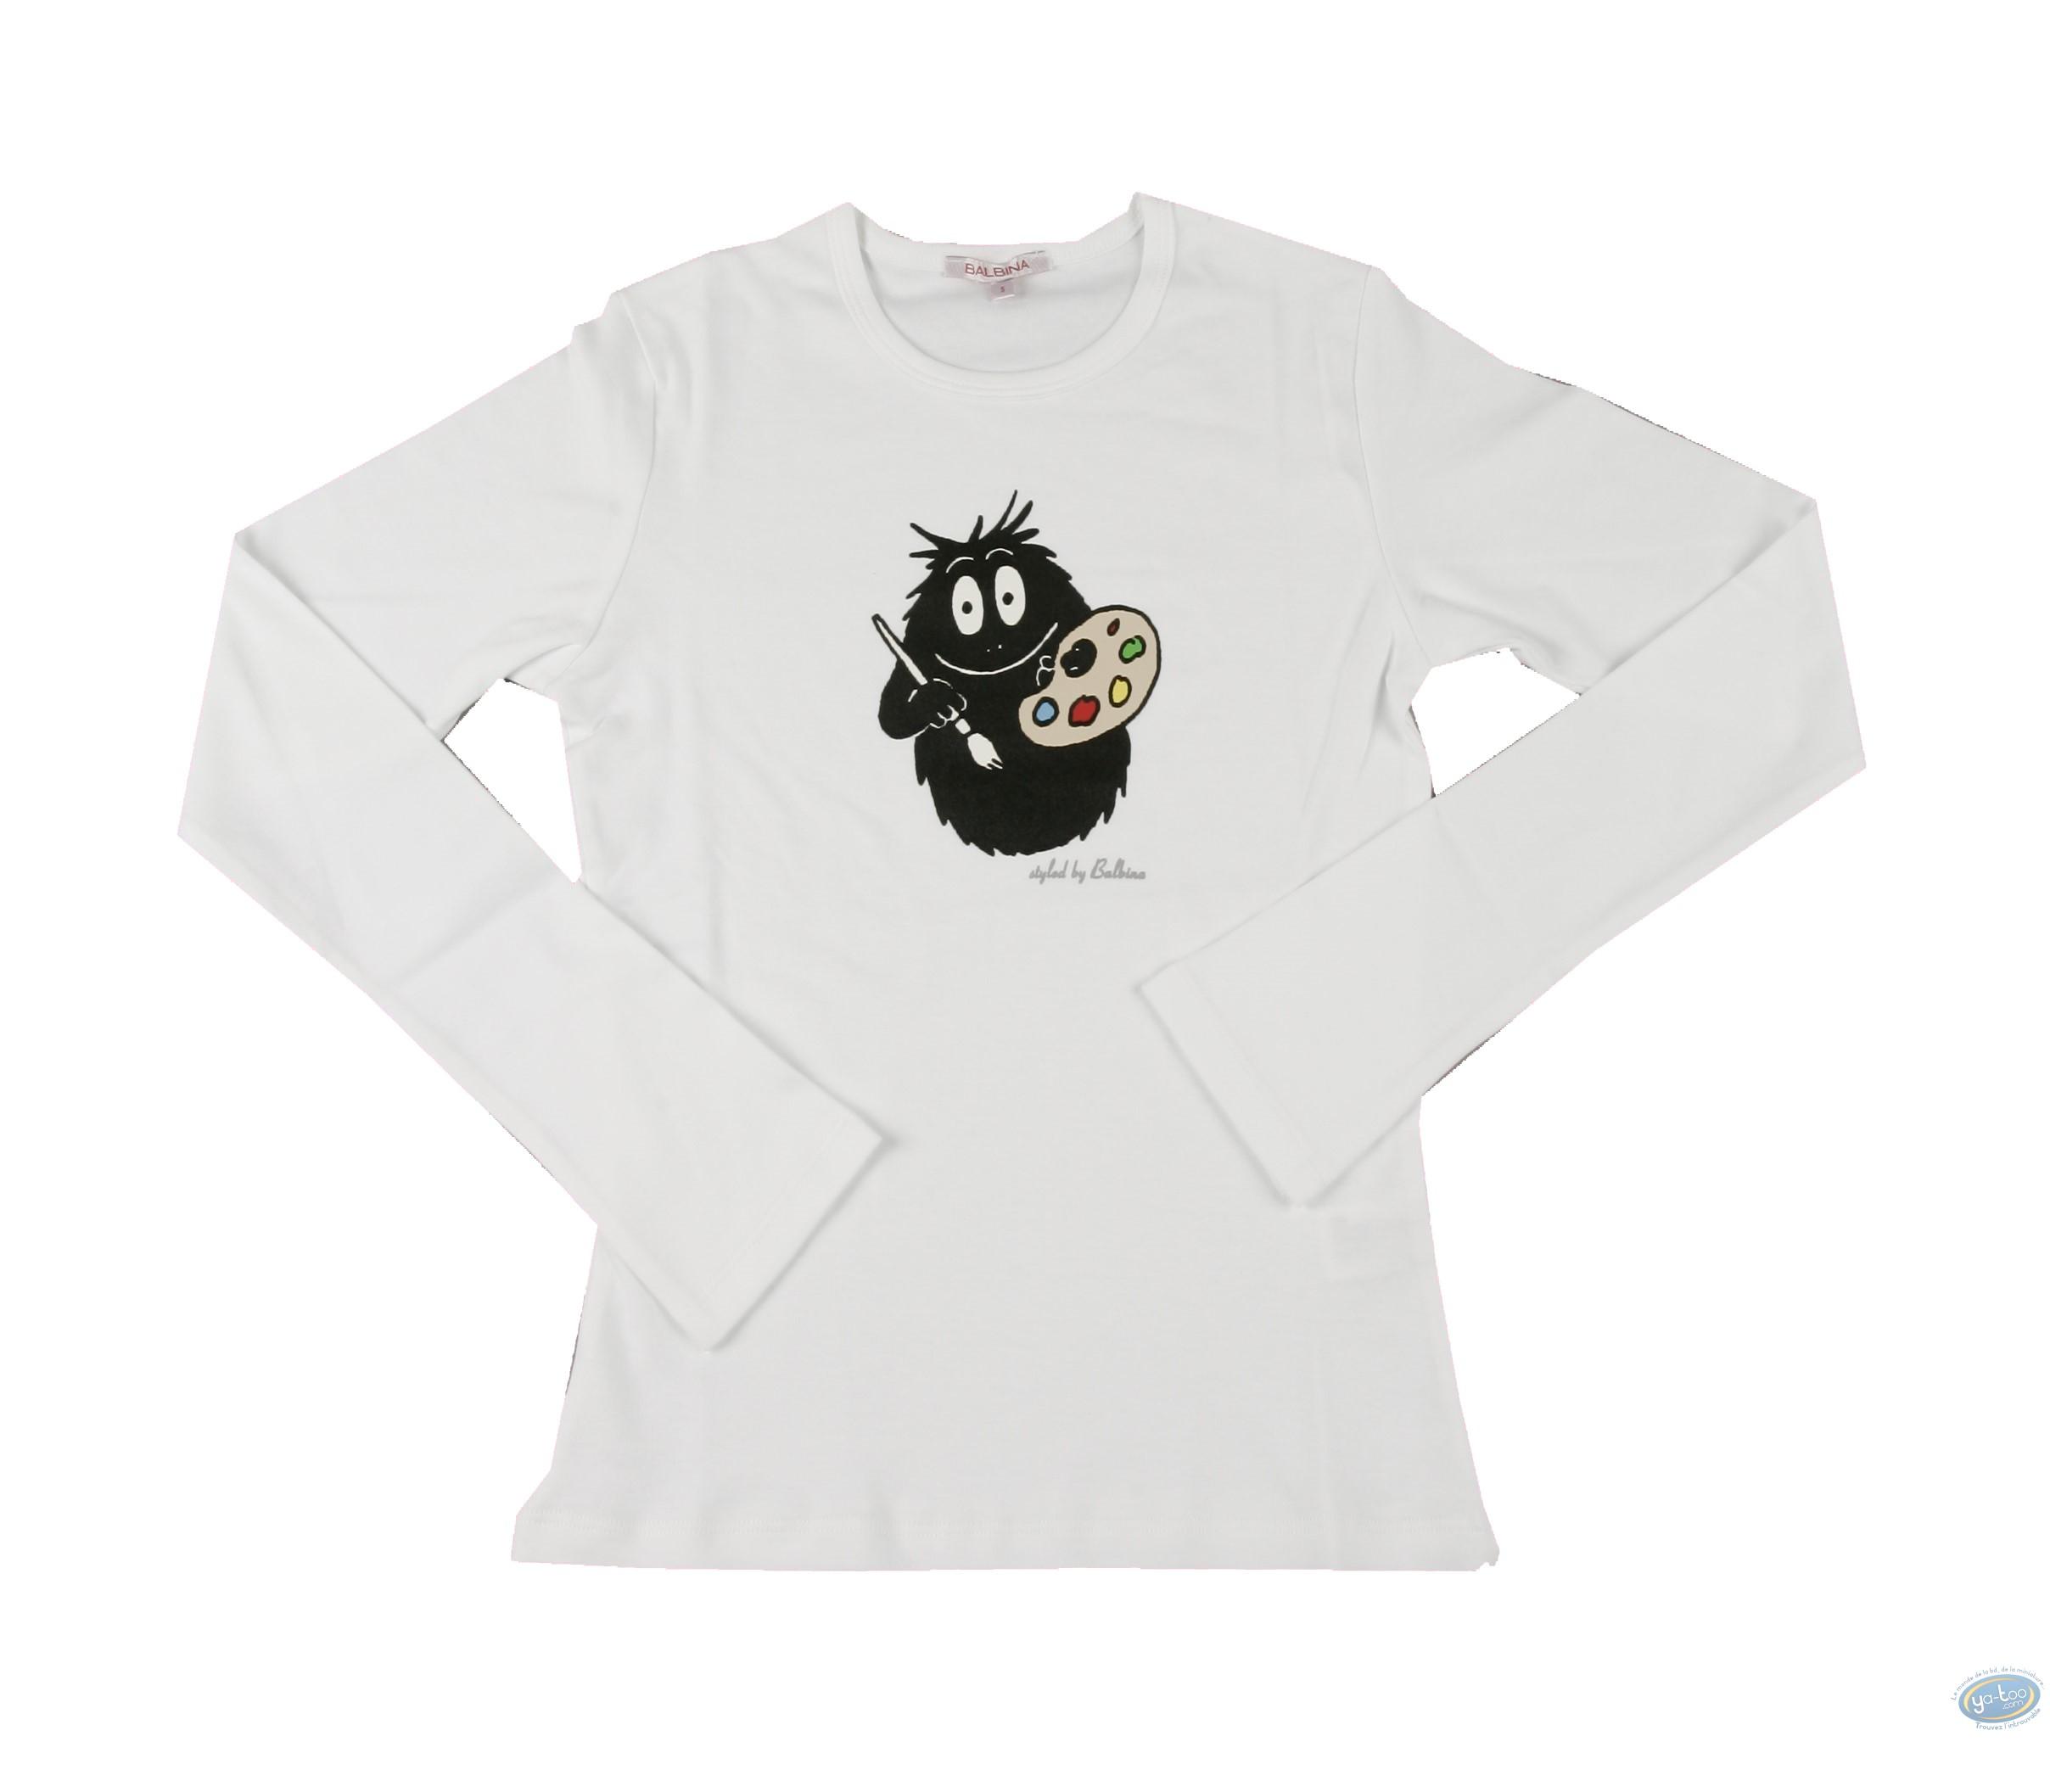 Vêtement, Barbapapa : T-shirt manches longues blanc Barbapapa: taille XS, peintre